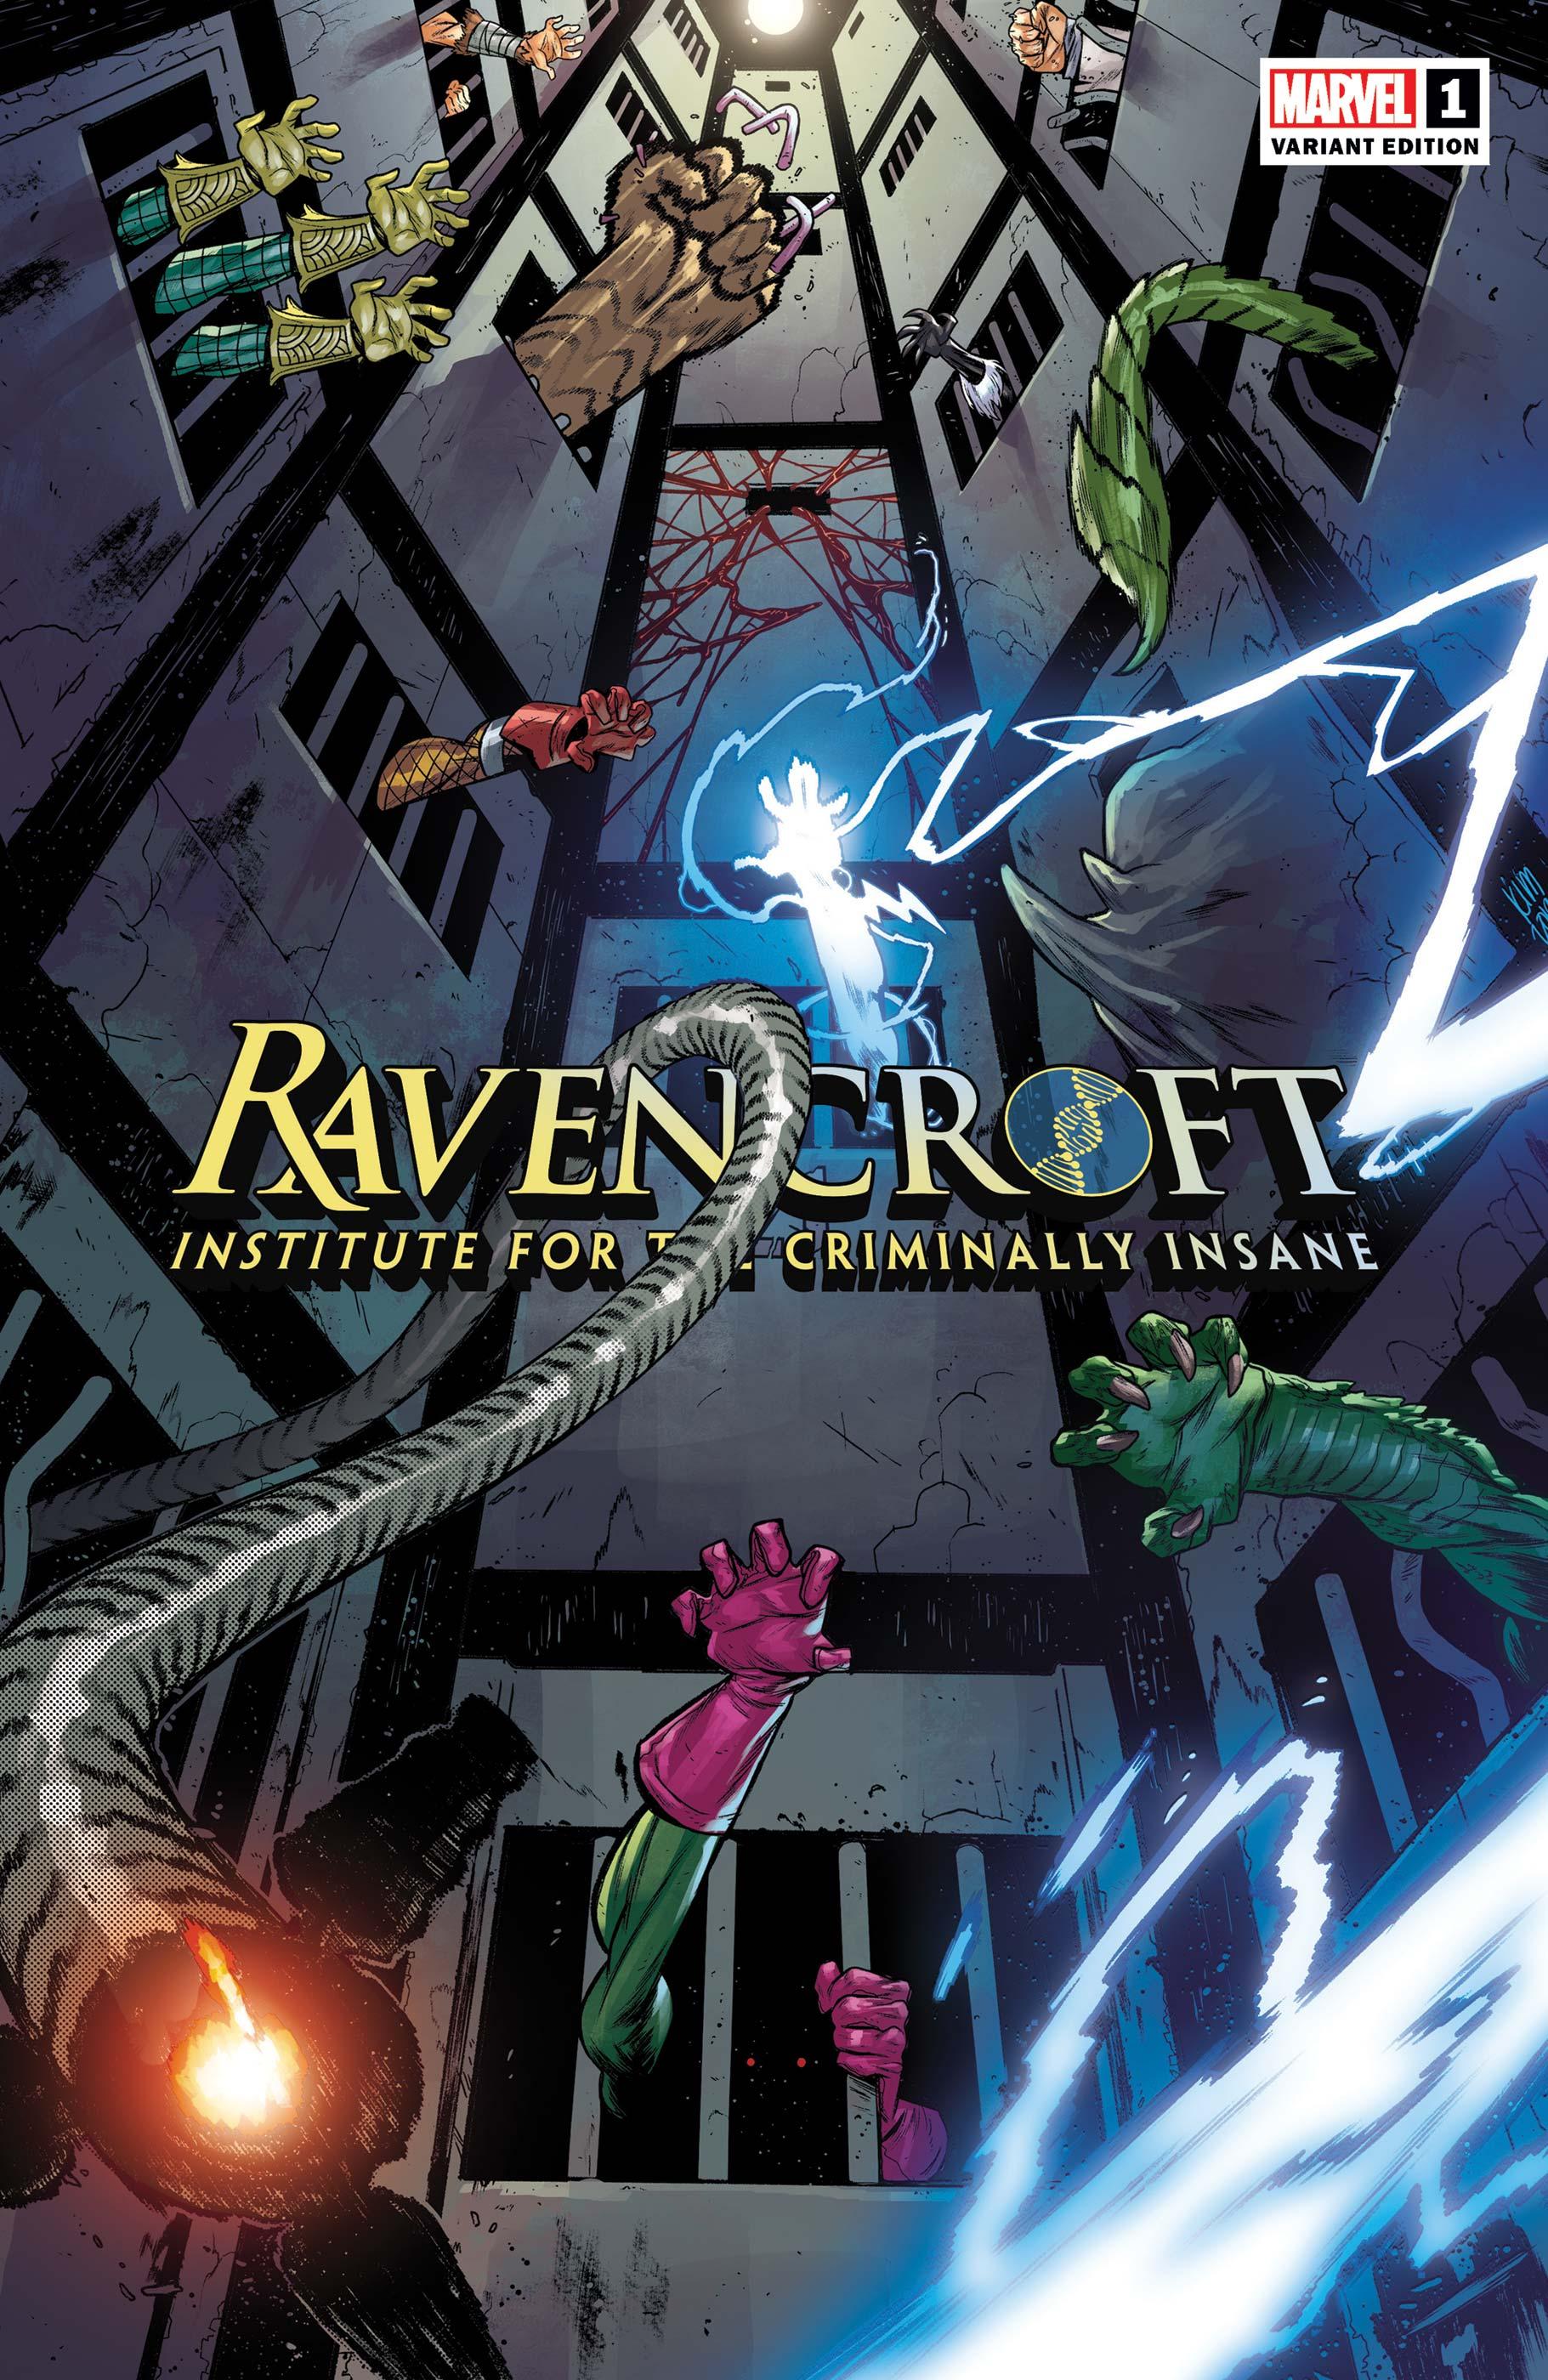 Ravencroft (2020) #1 (Variant)